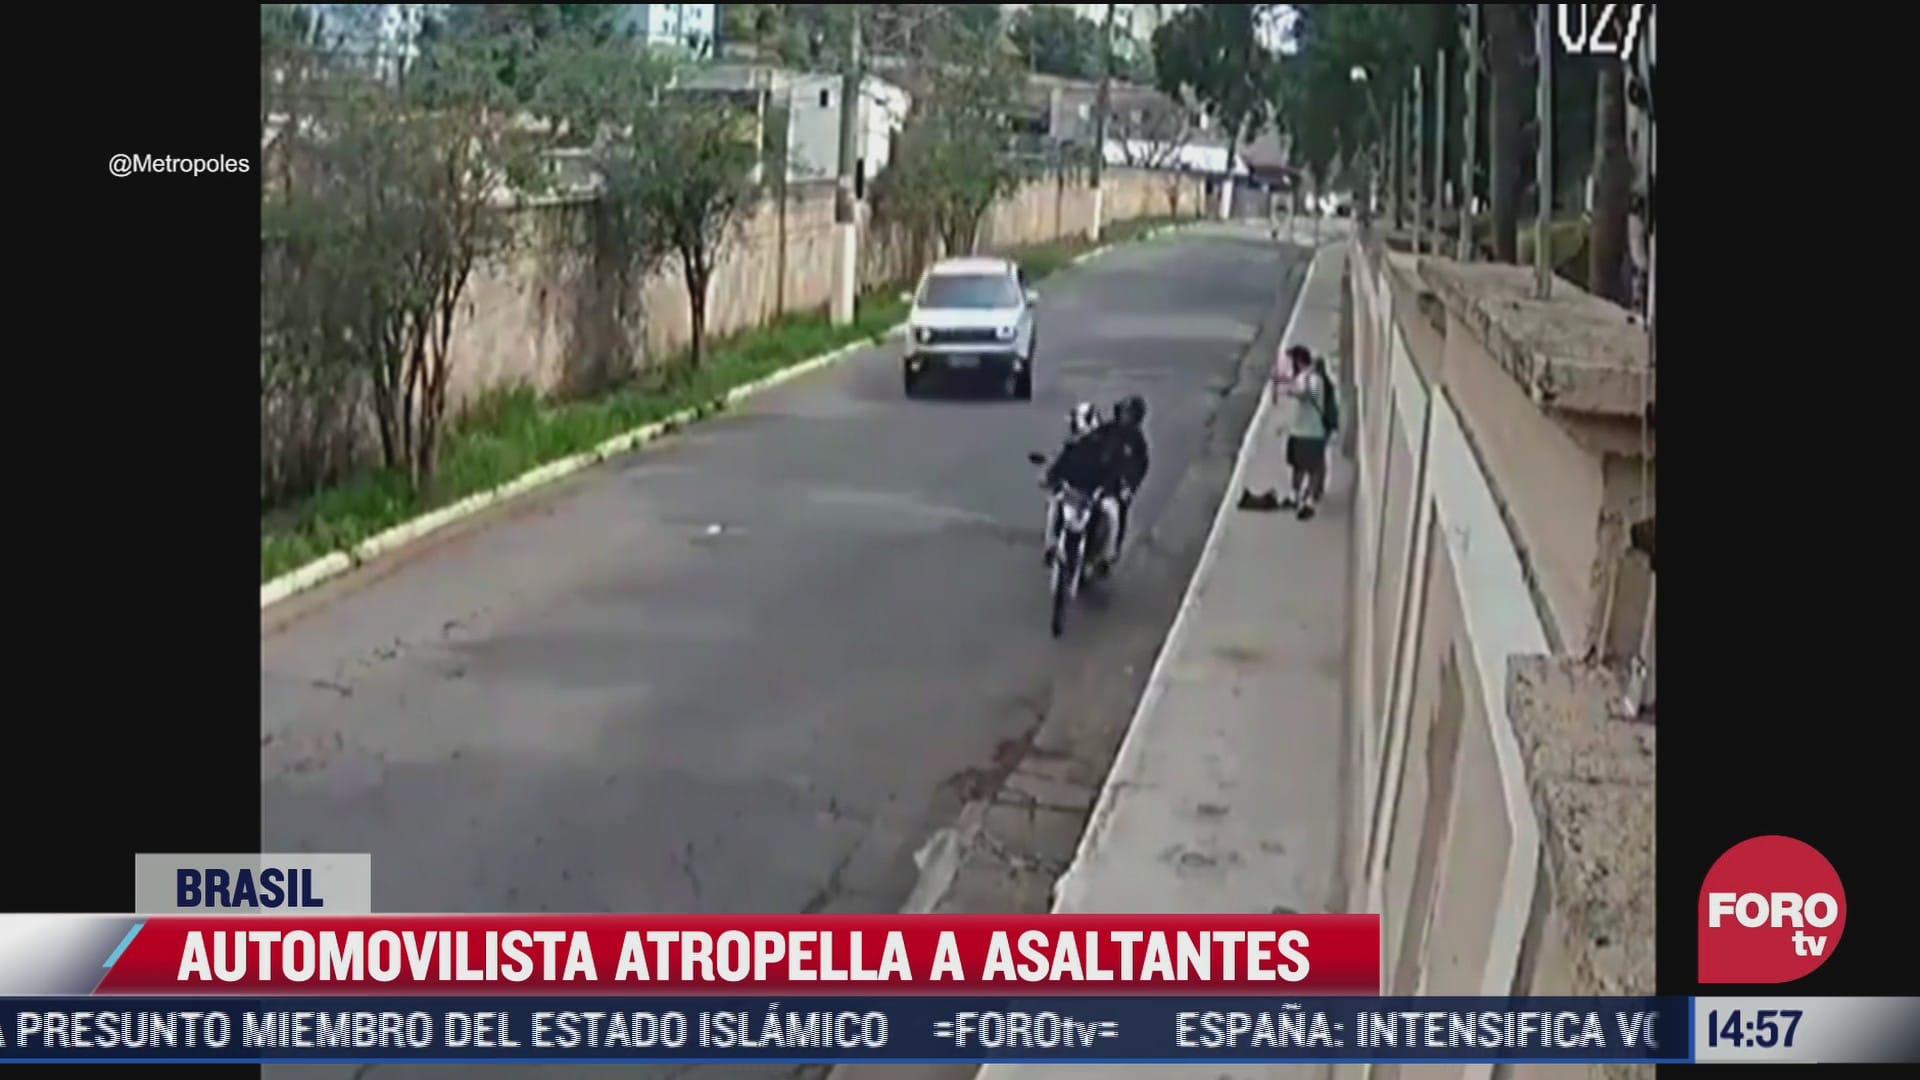 video automovilista atropella a asaltantes en brasil